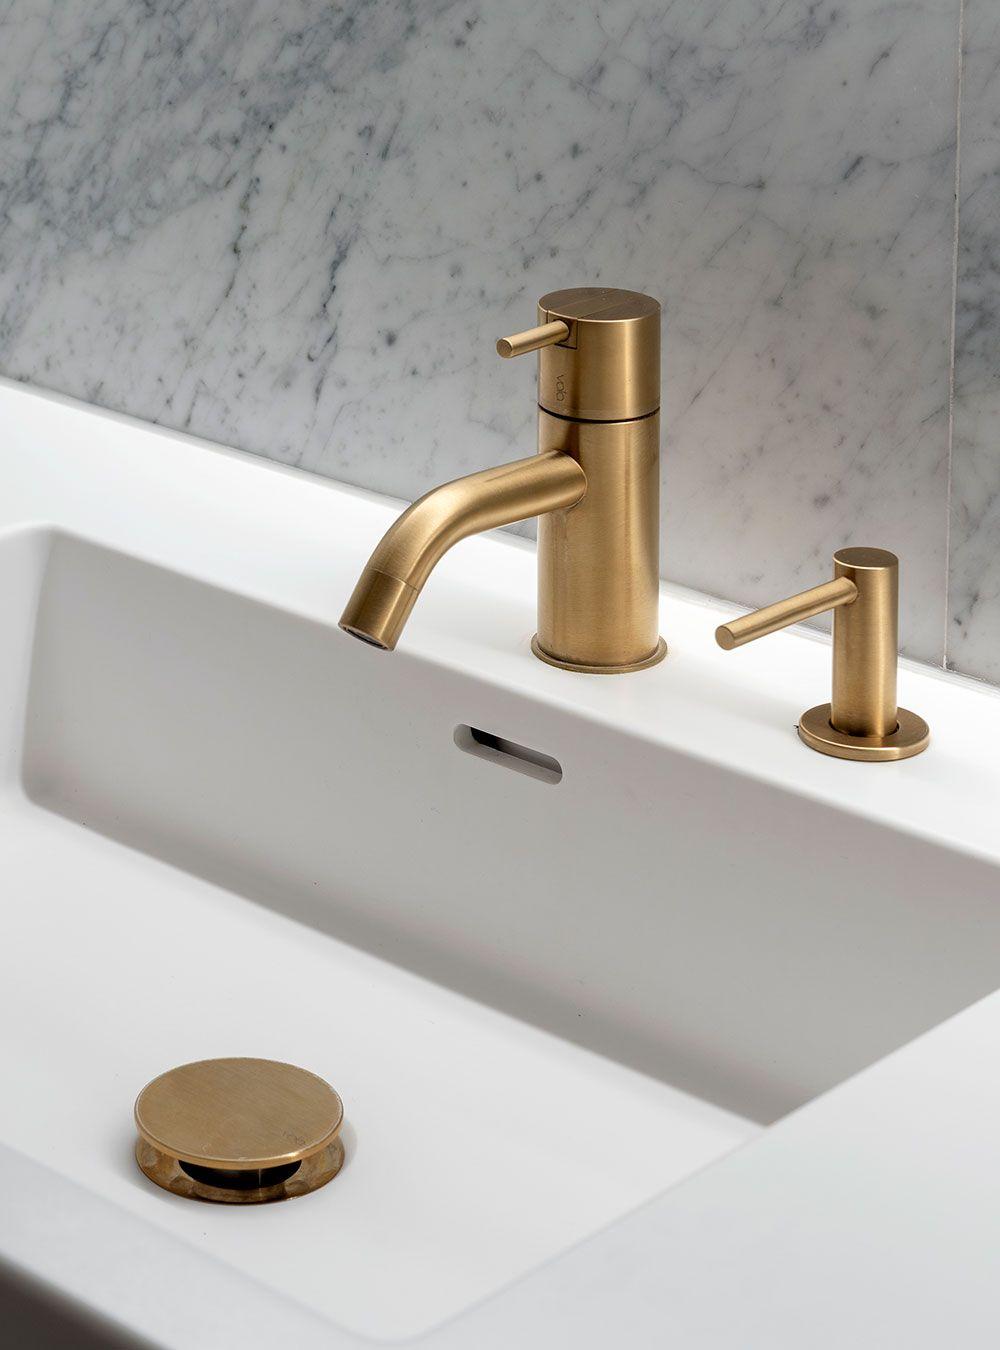 Brushed Gold Bathroom Faucet